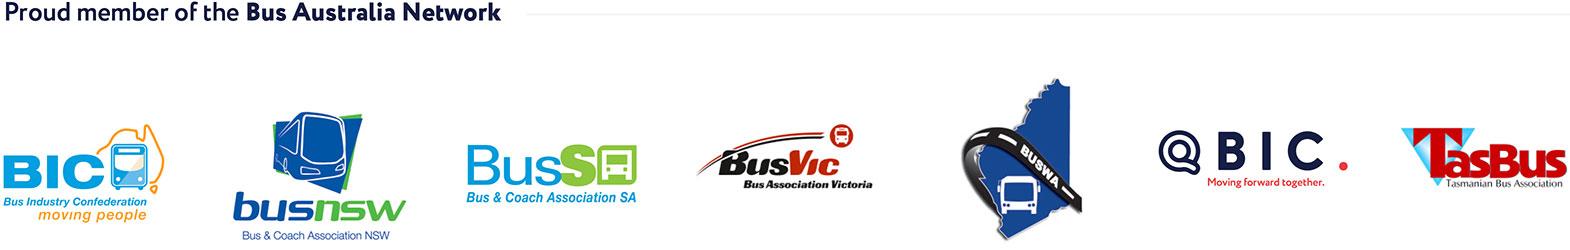 busstop buses coaches kinglong king long ibus yutong sales service parts fleet maintenance brisbane 66